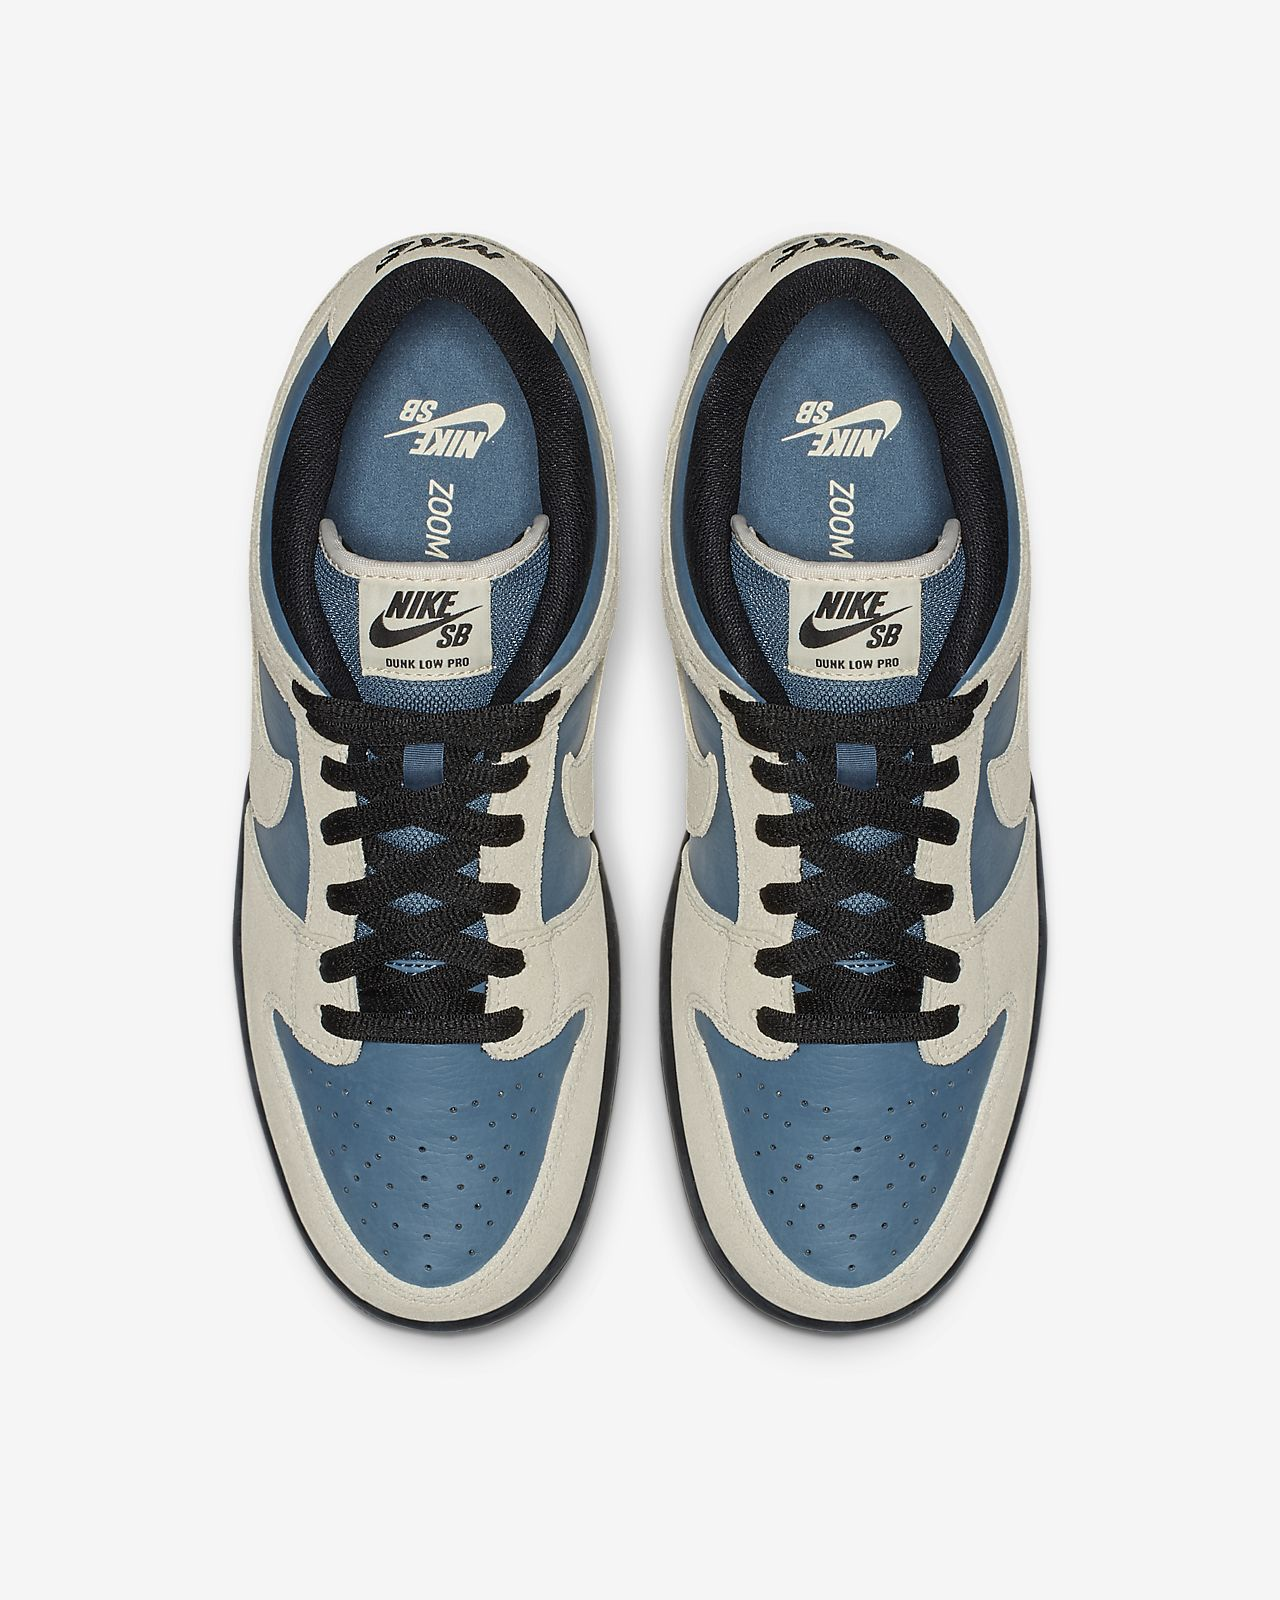 big sale 9c100 cd880 ... Nike SB Dunk Low Pro Skate Shoe